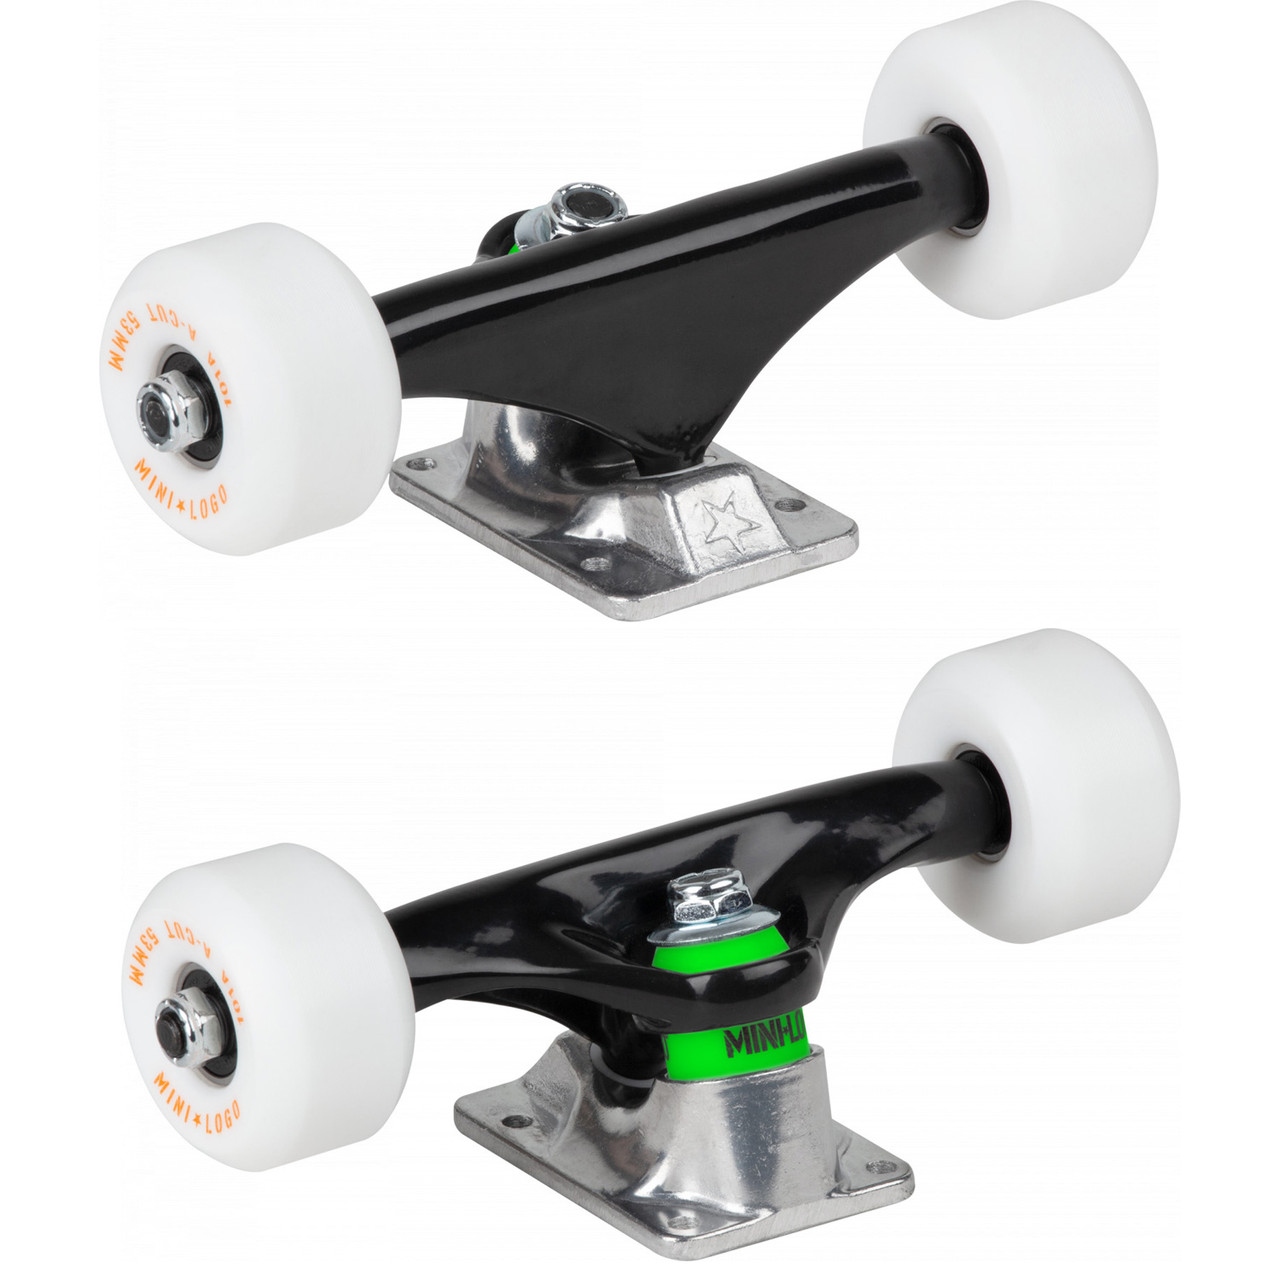 mini skateboard deck kit with black grip tape and wheel